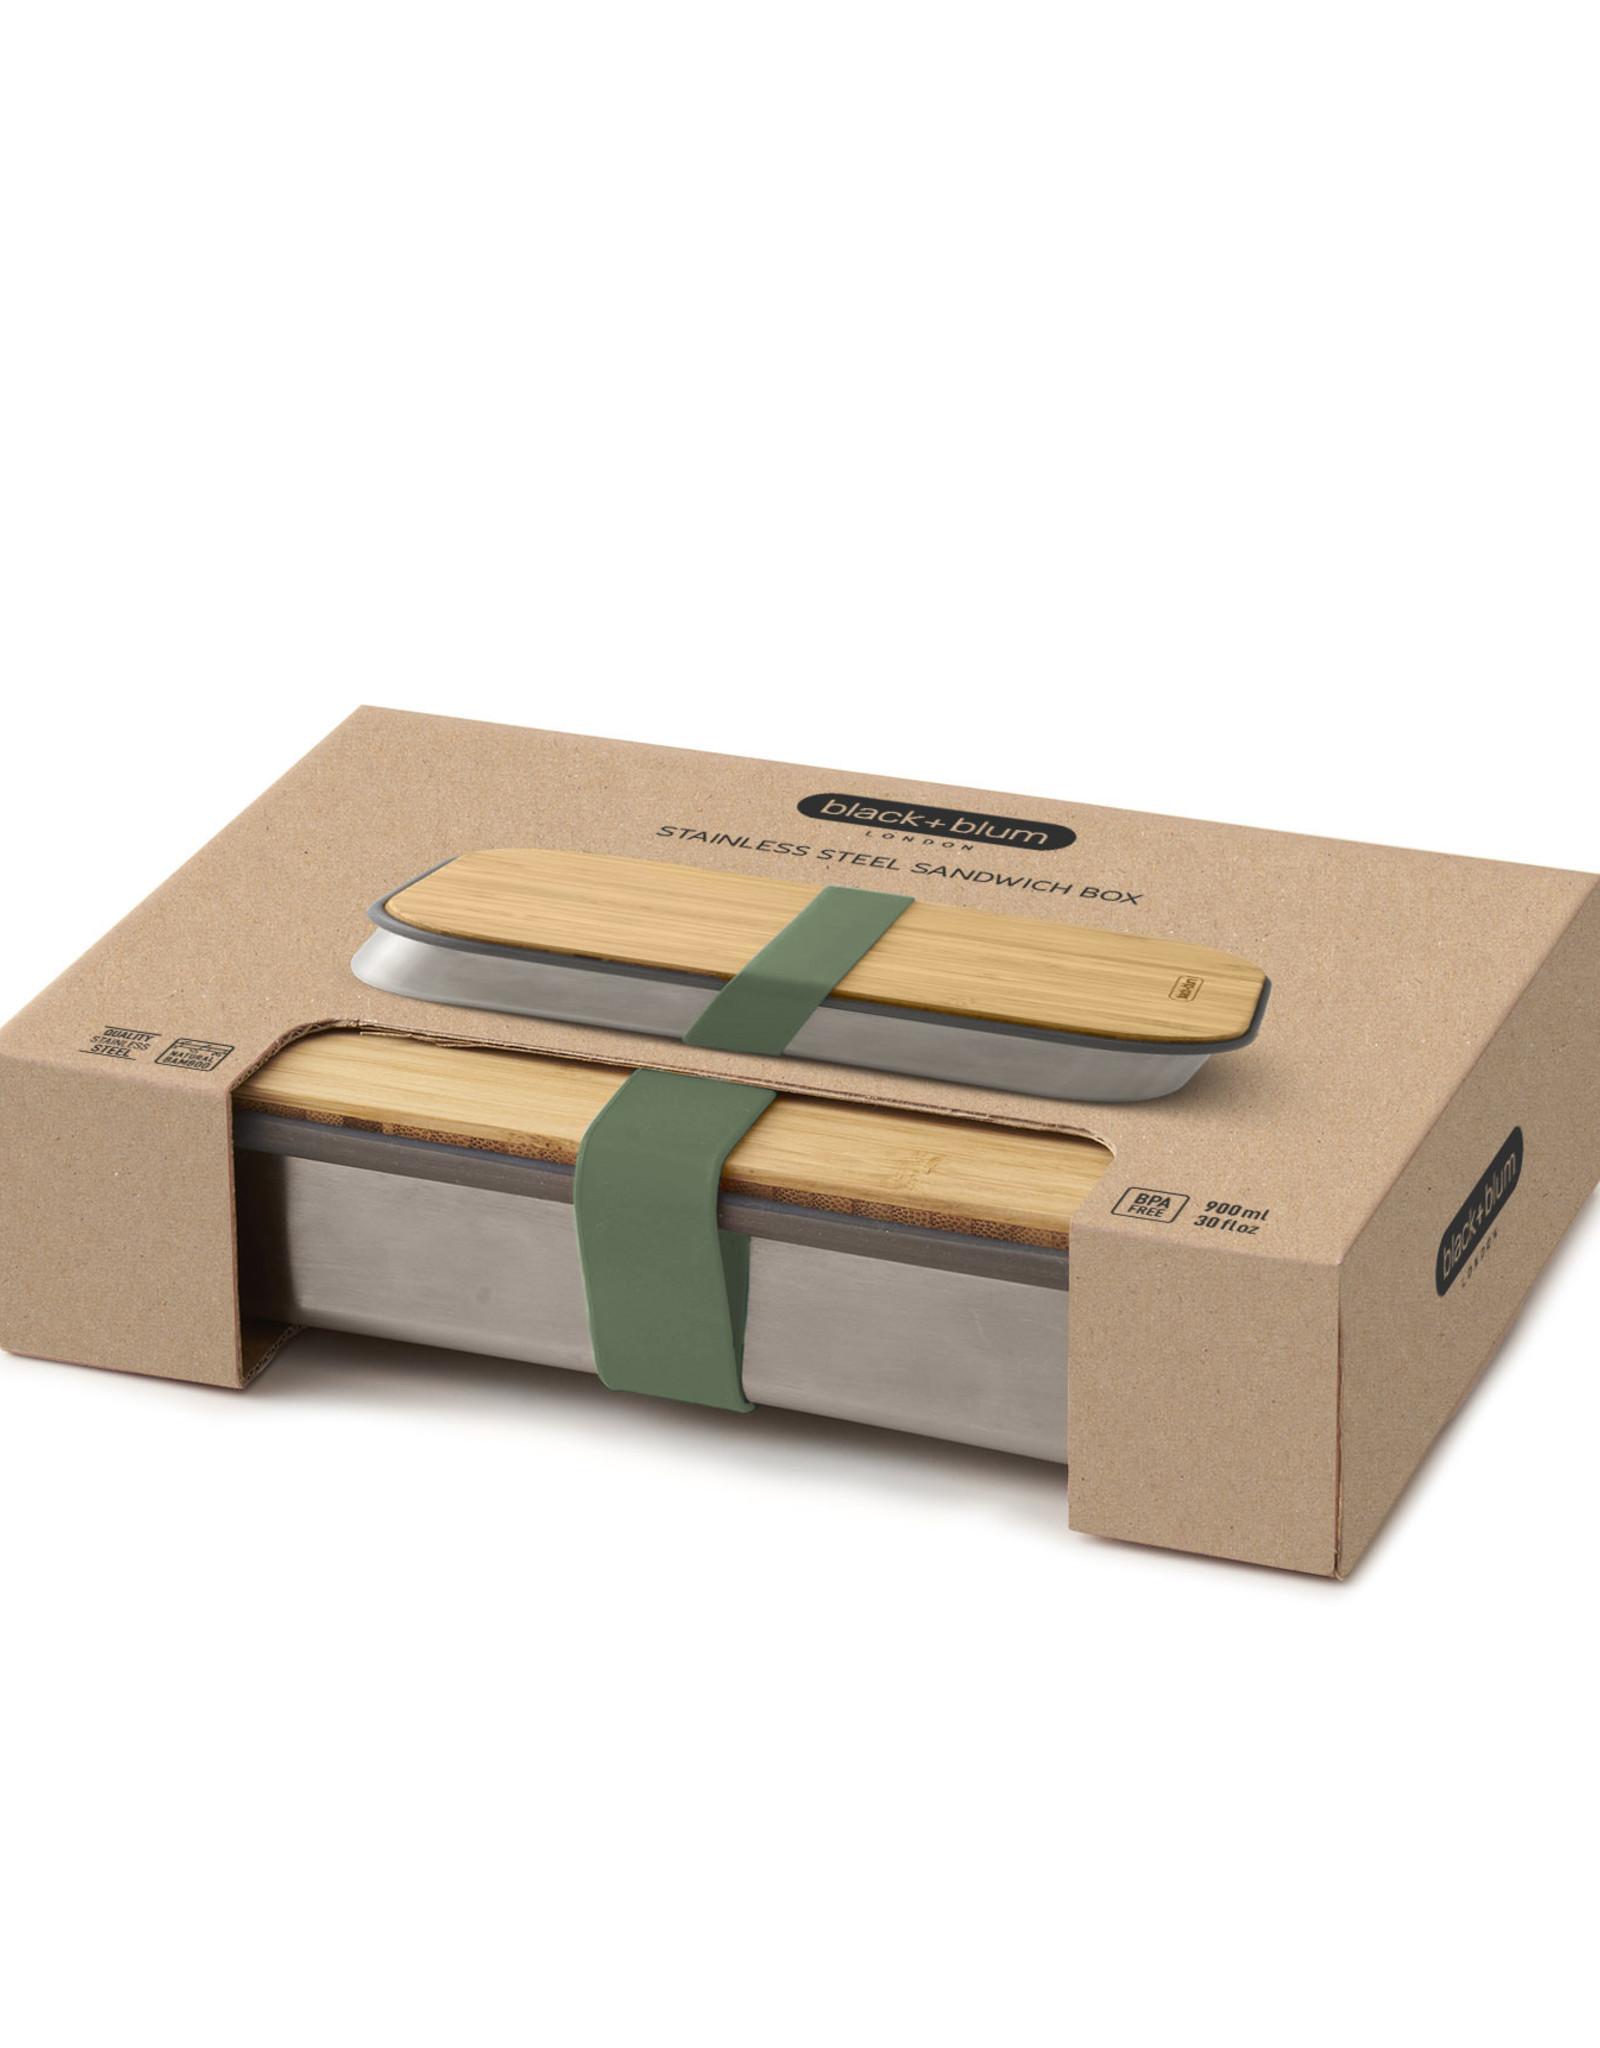 Sandwich box olive